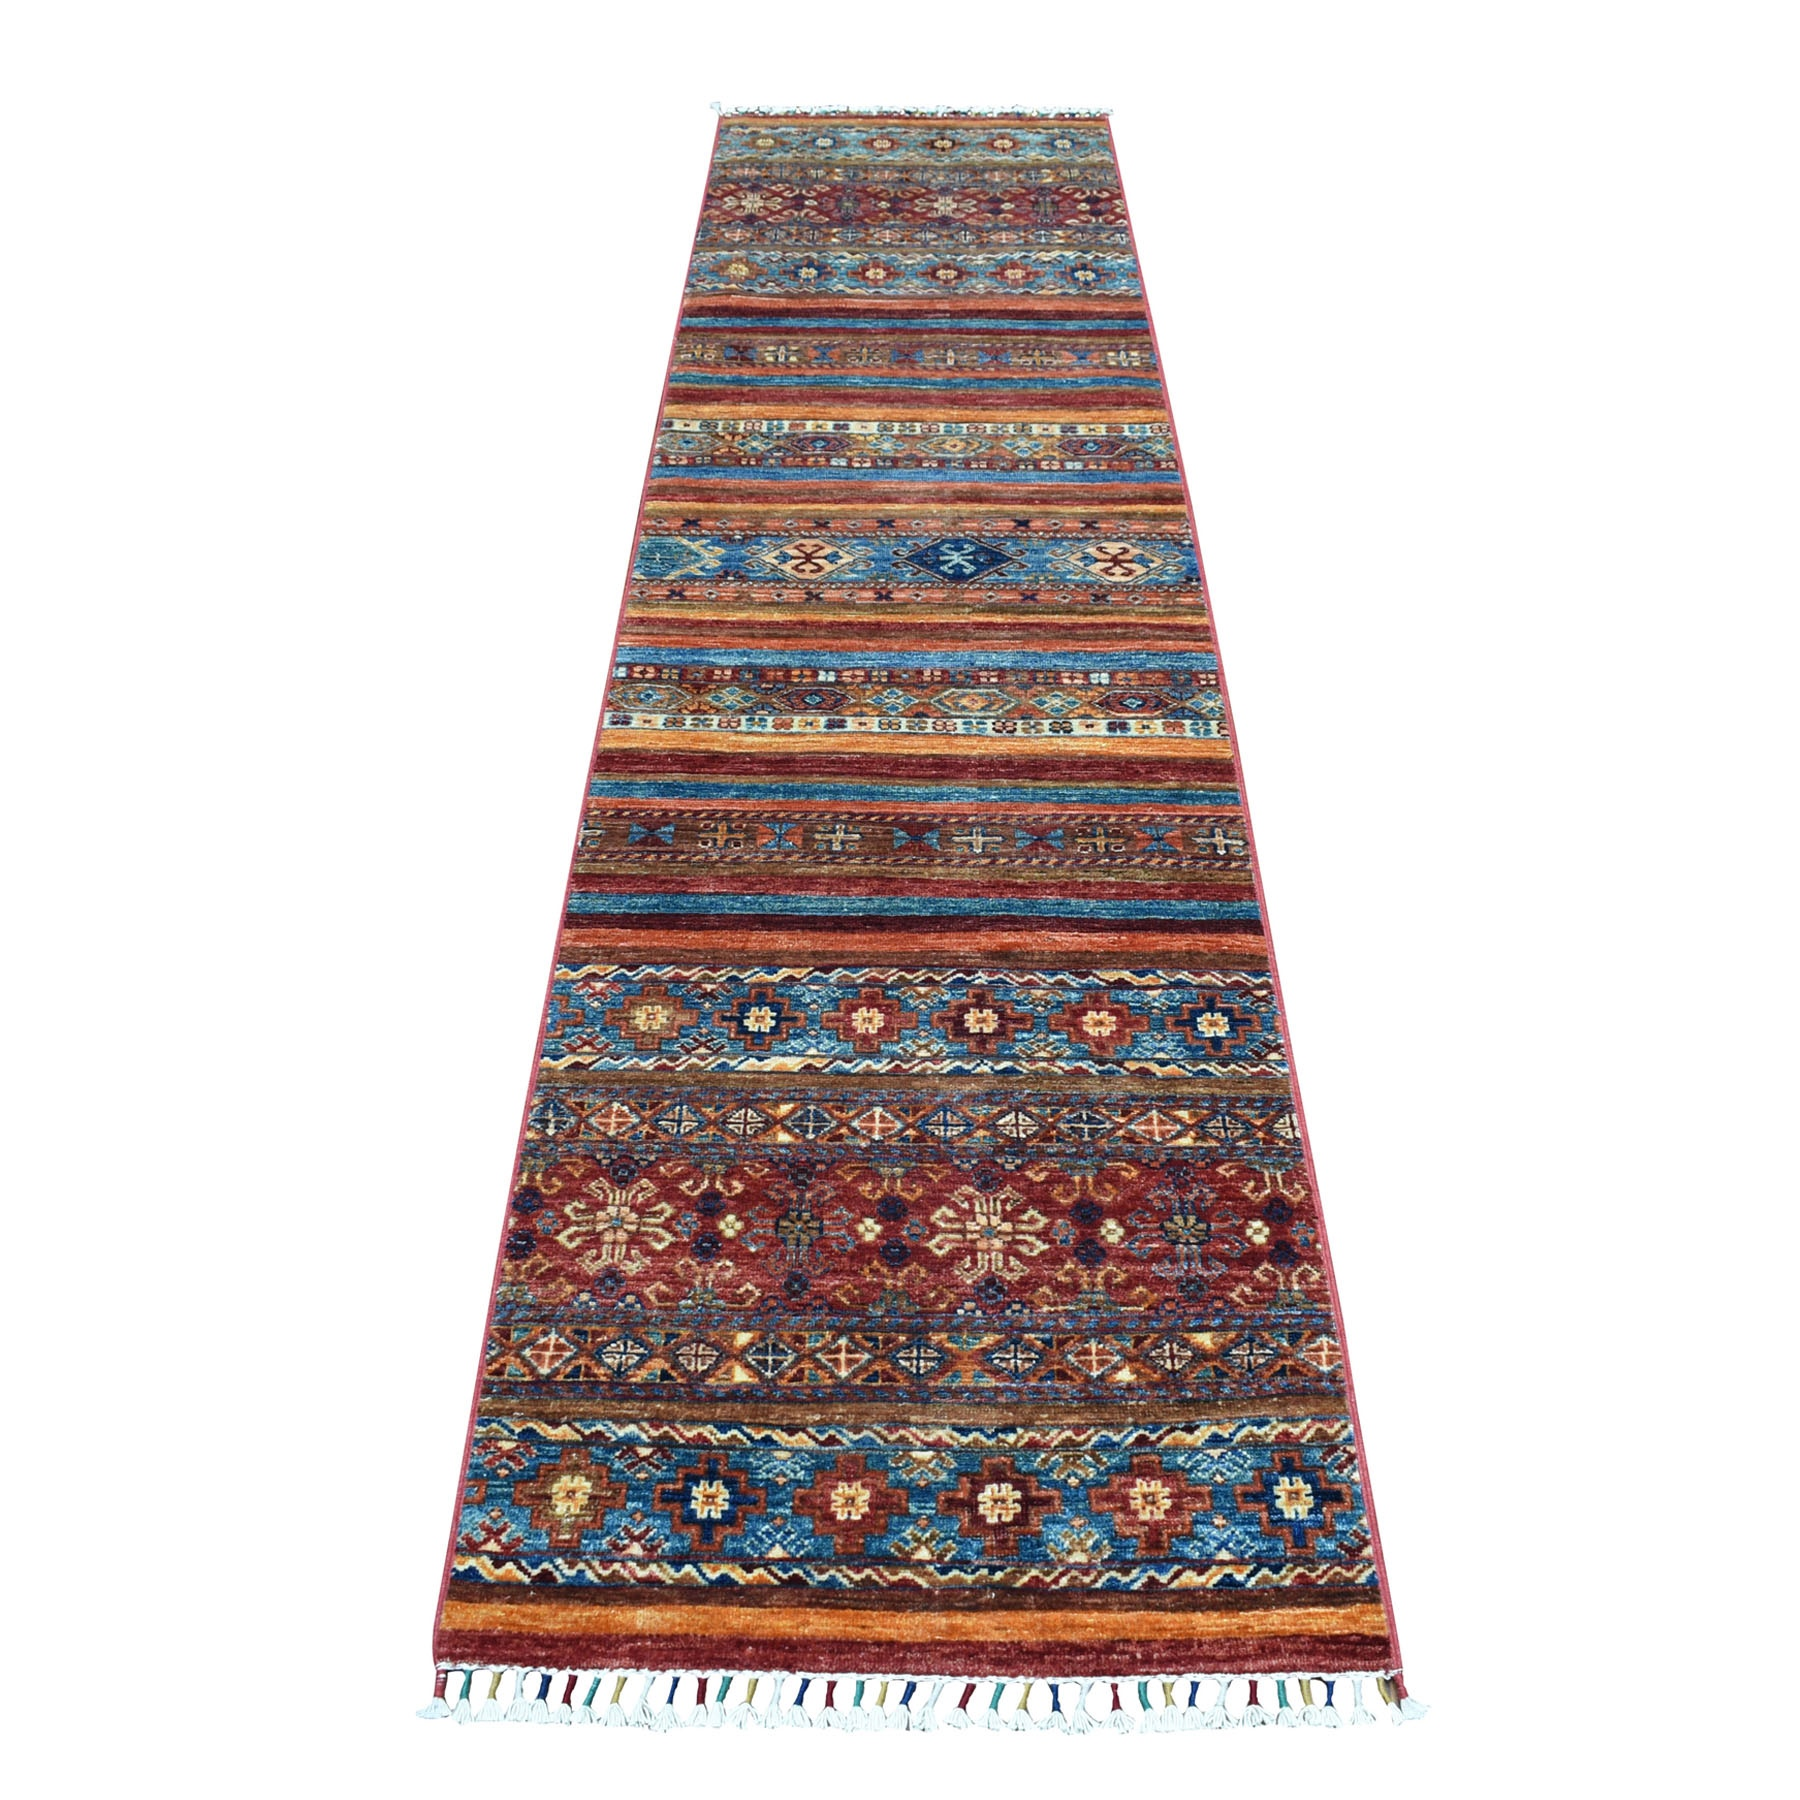 "2'4""x9'8"" Khorjin Design Colorful Super Kazak Pure Wool Narrow Runner  Hand Knotted Oriental Rug"